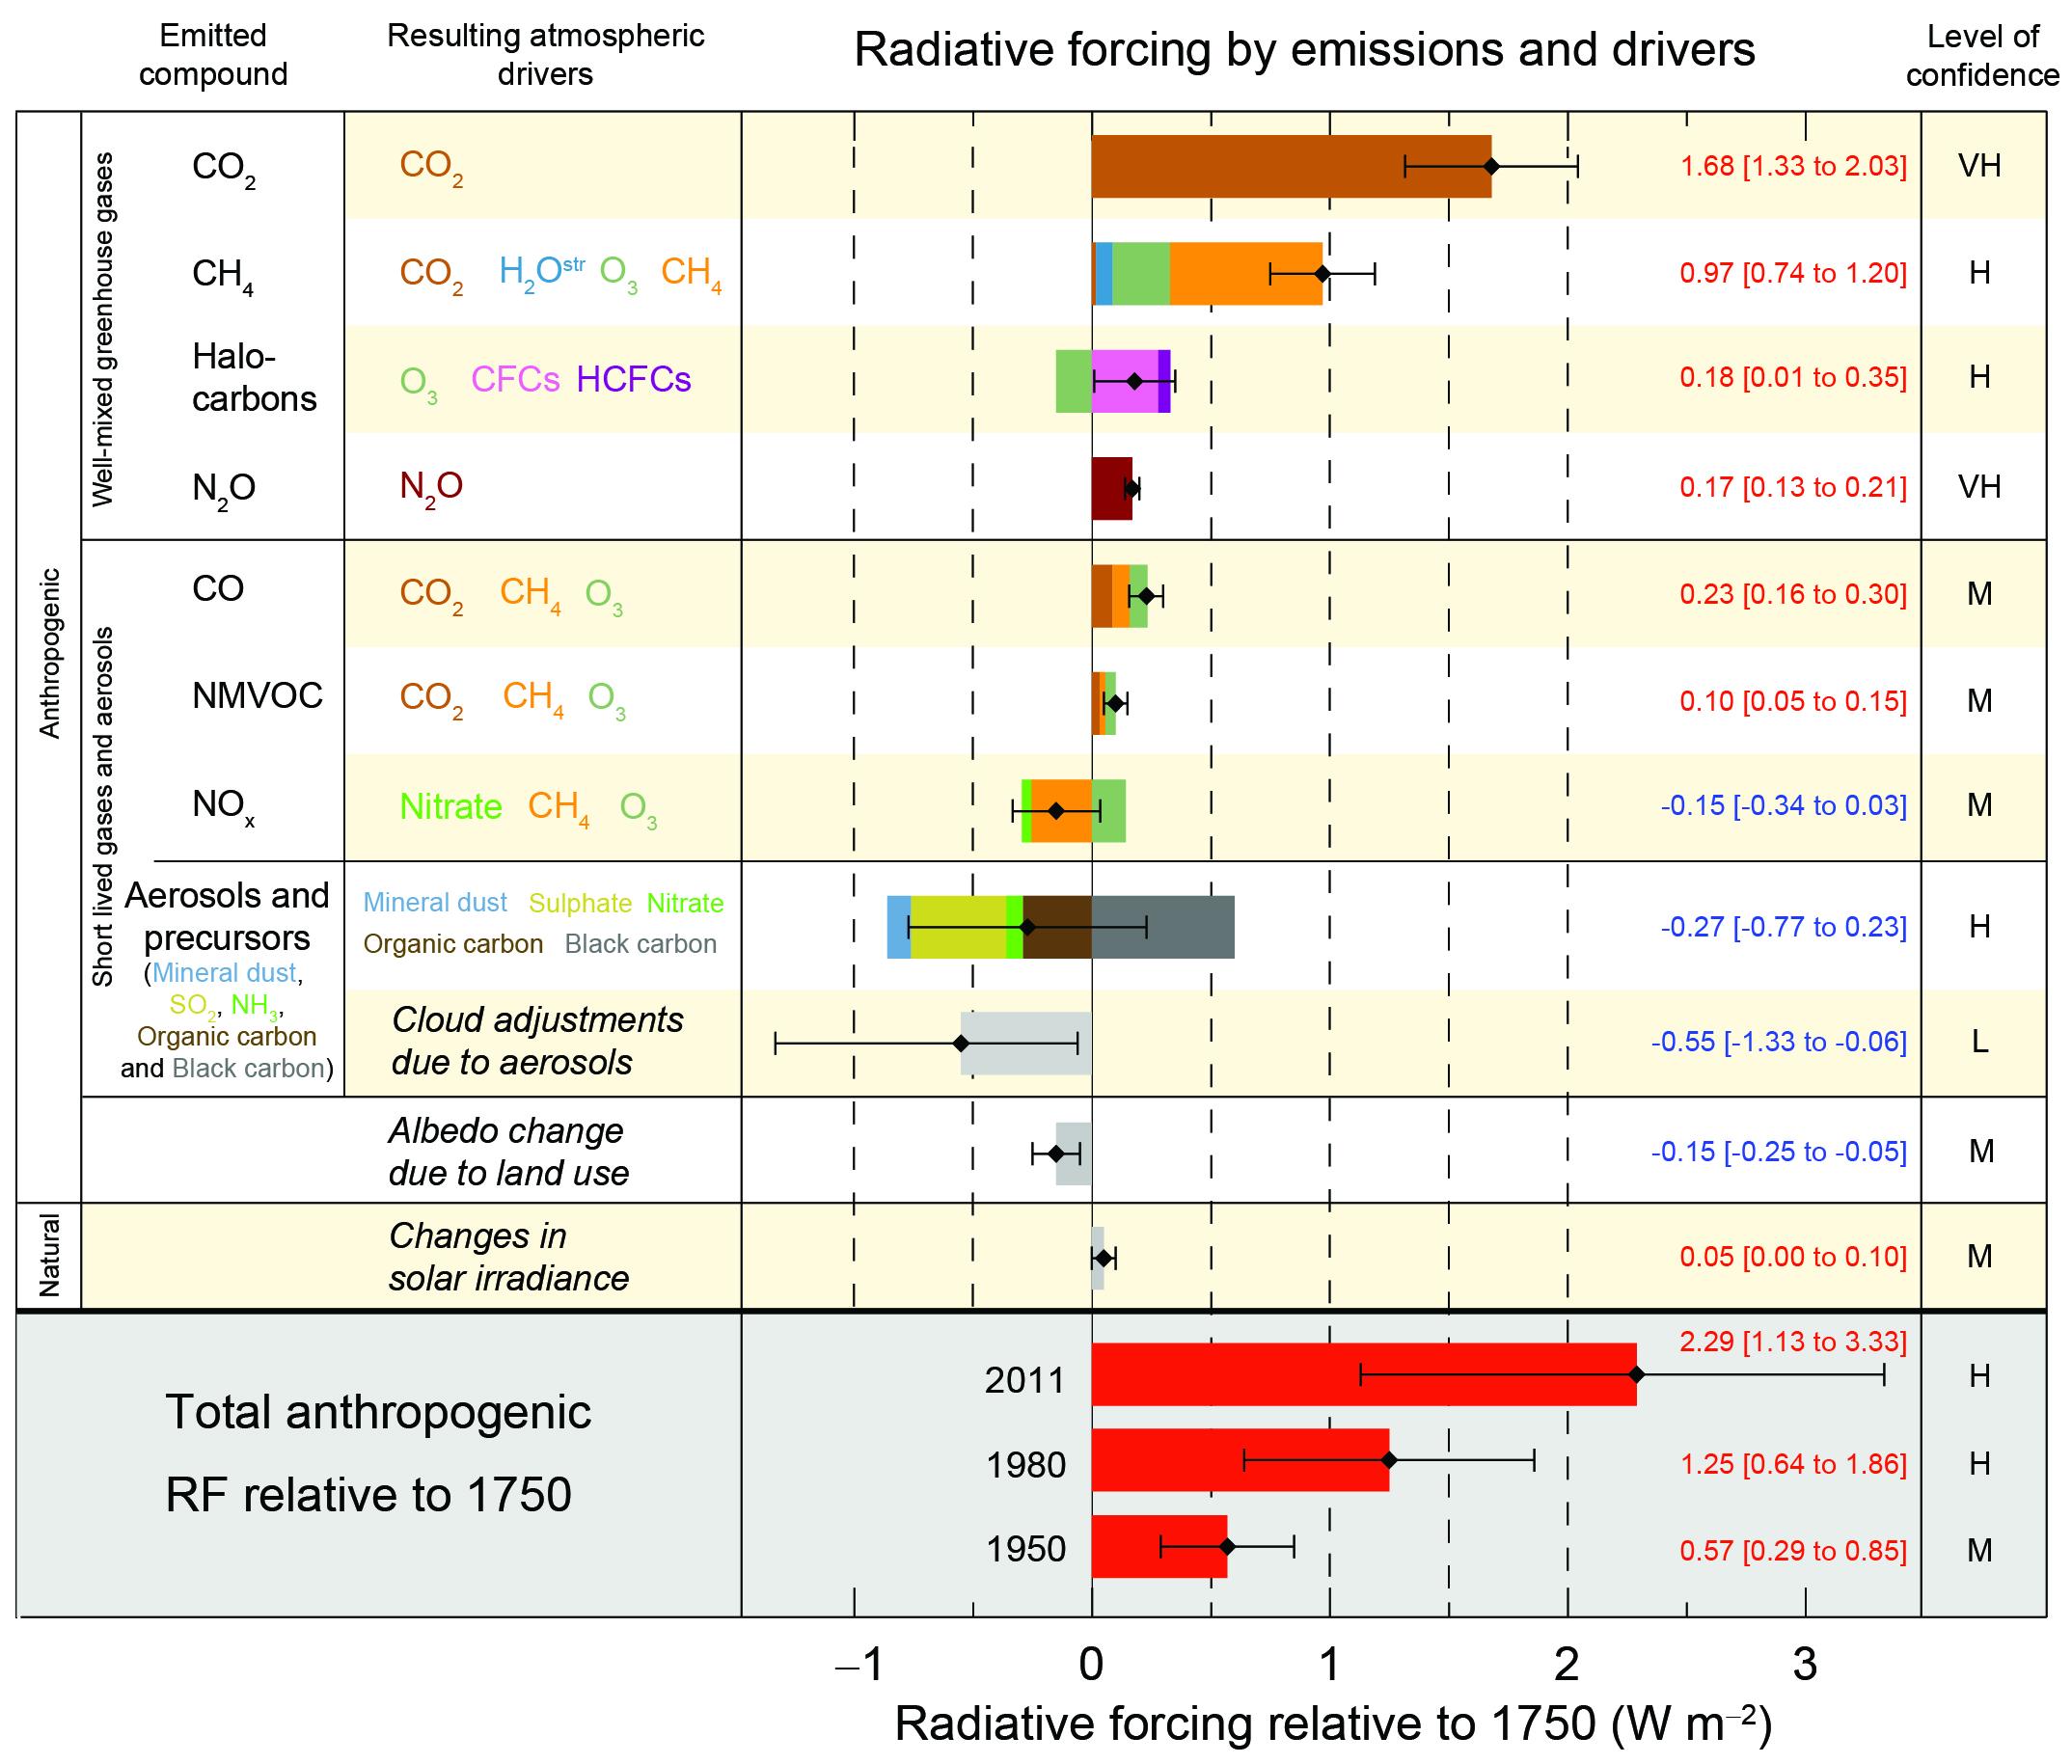 AR5 Radiative Forcings